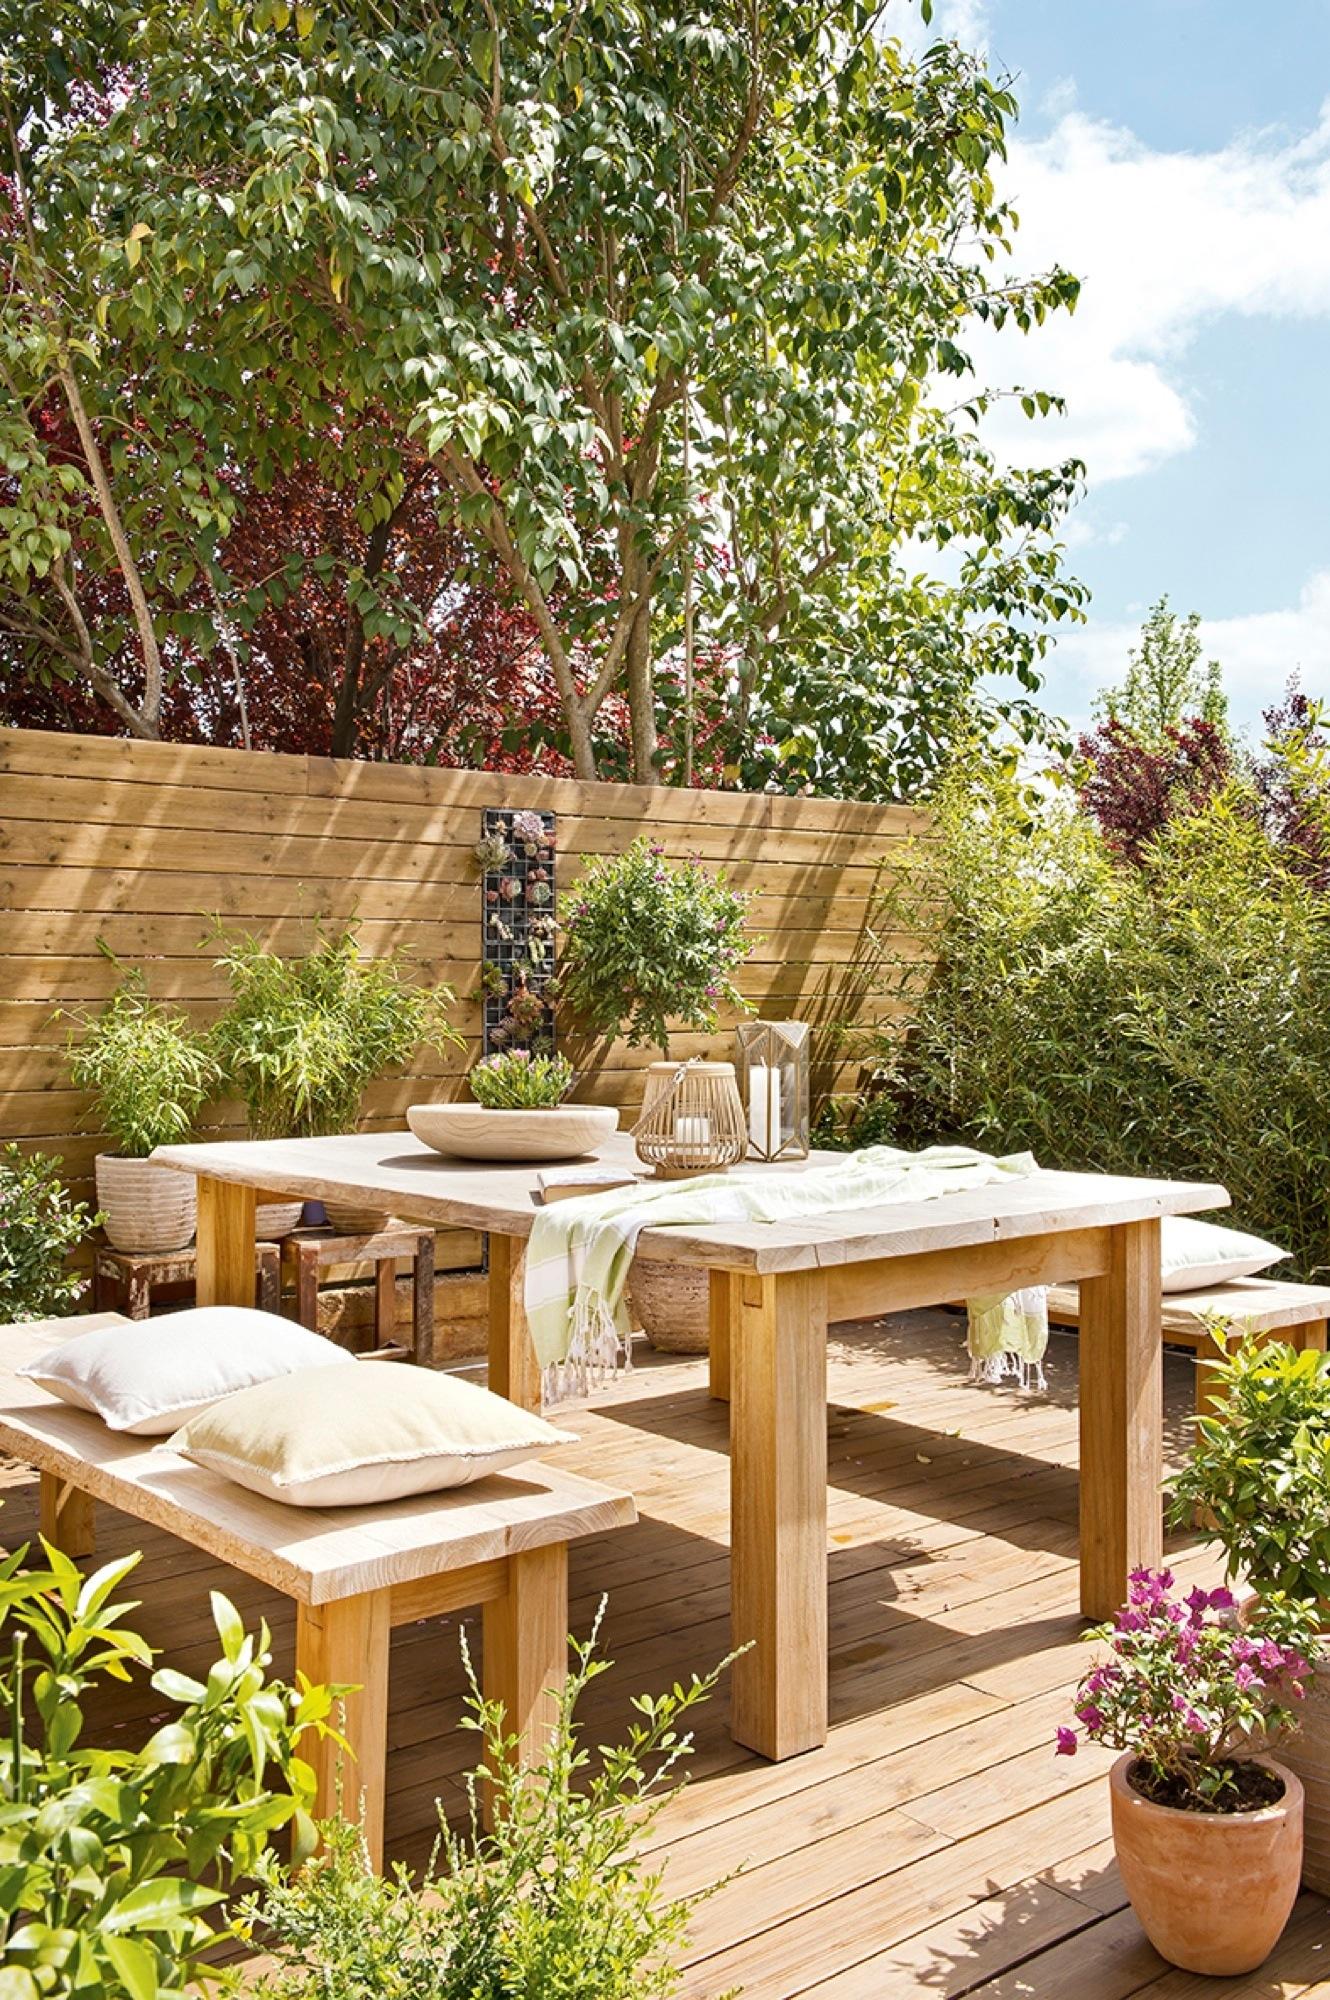 Jardin vertical terraza espai can mir idees with jardin for Jardin vertical terraza